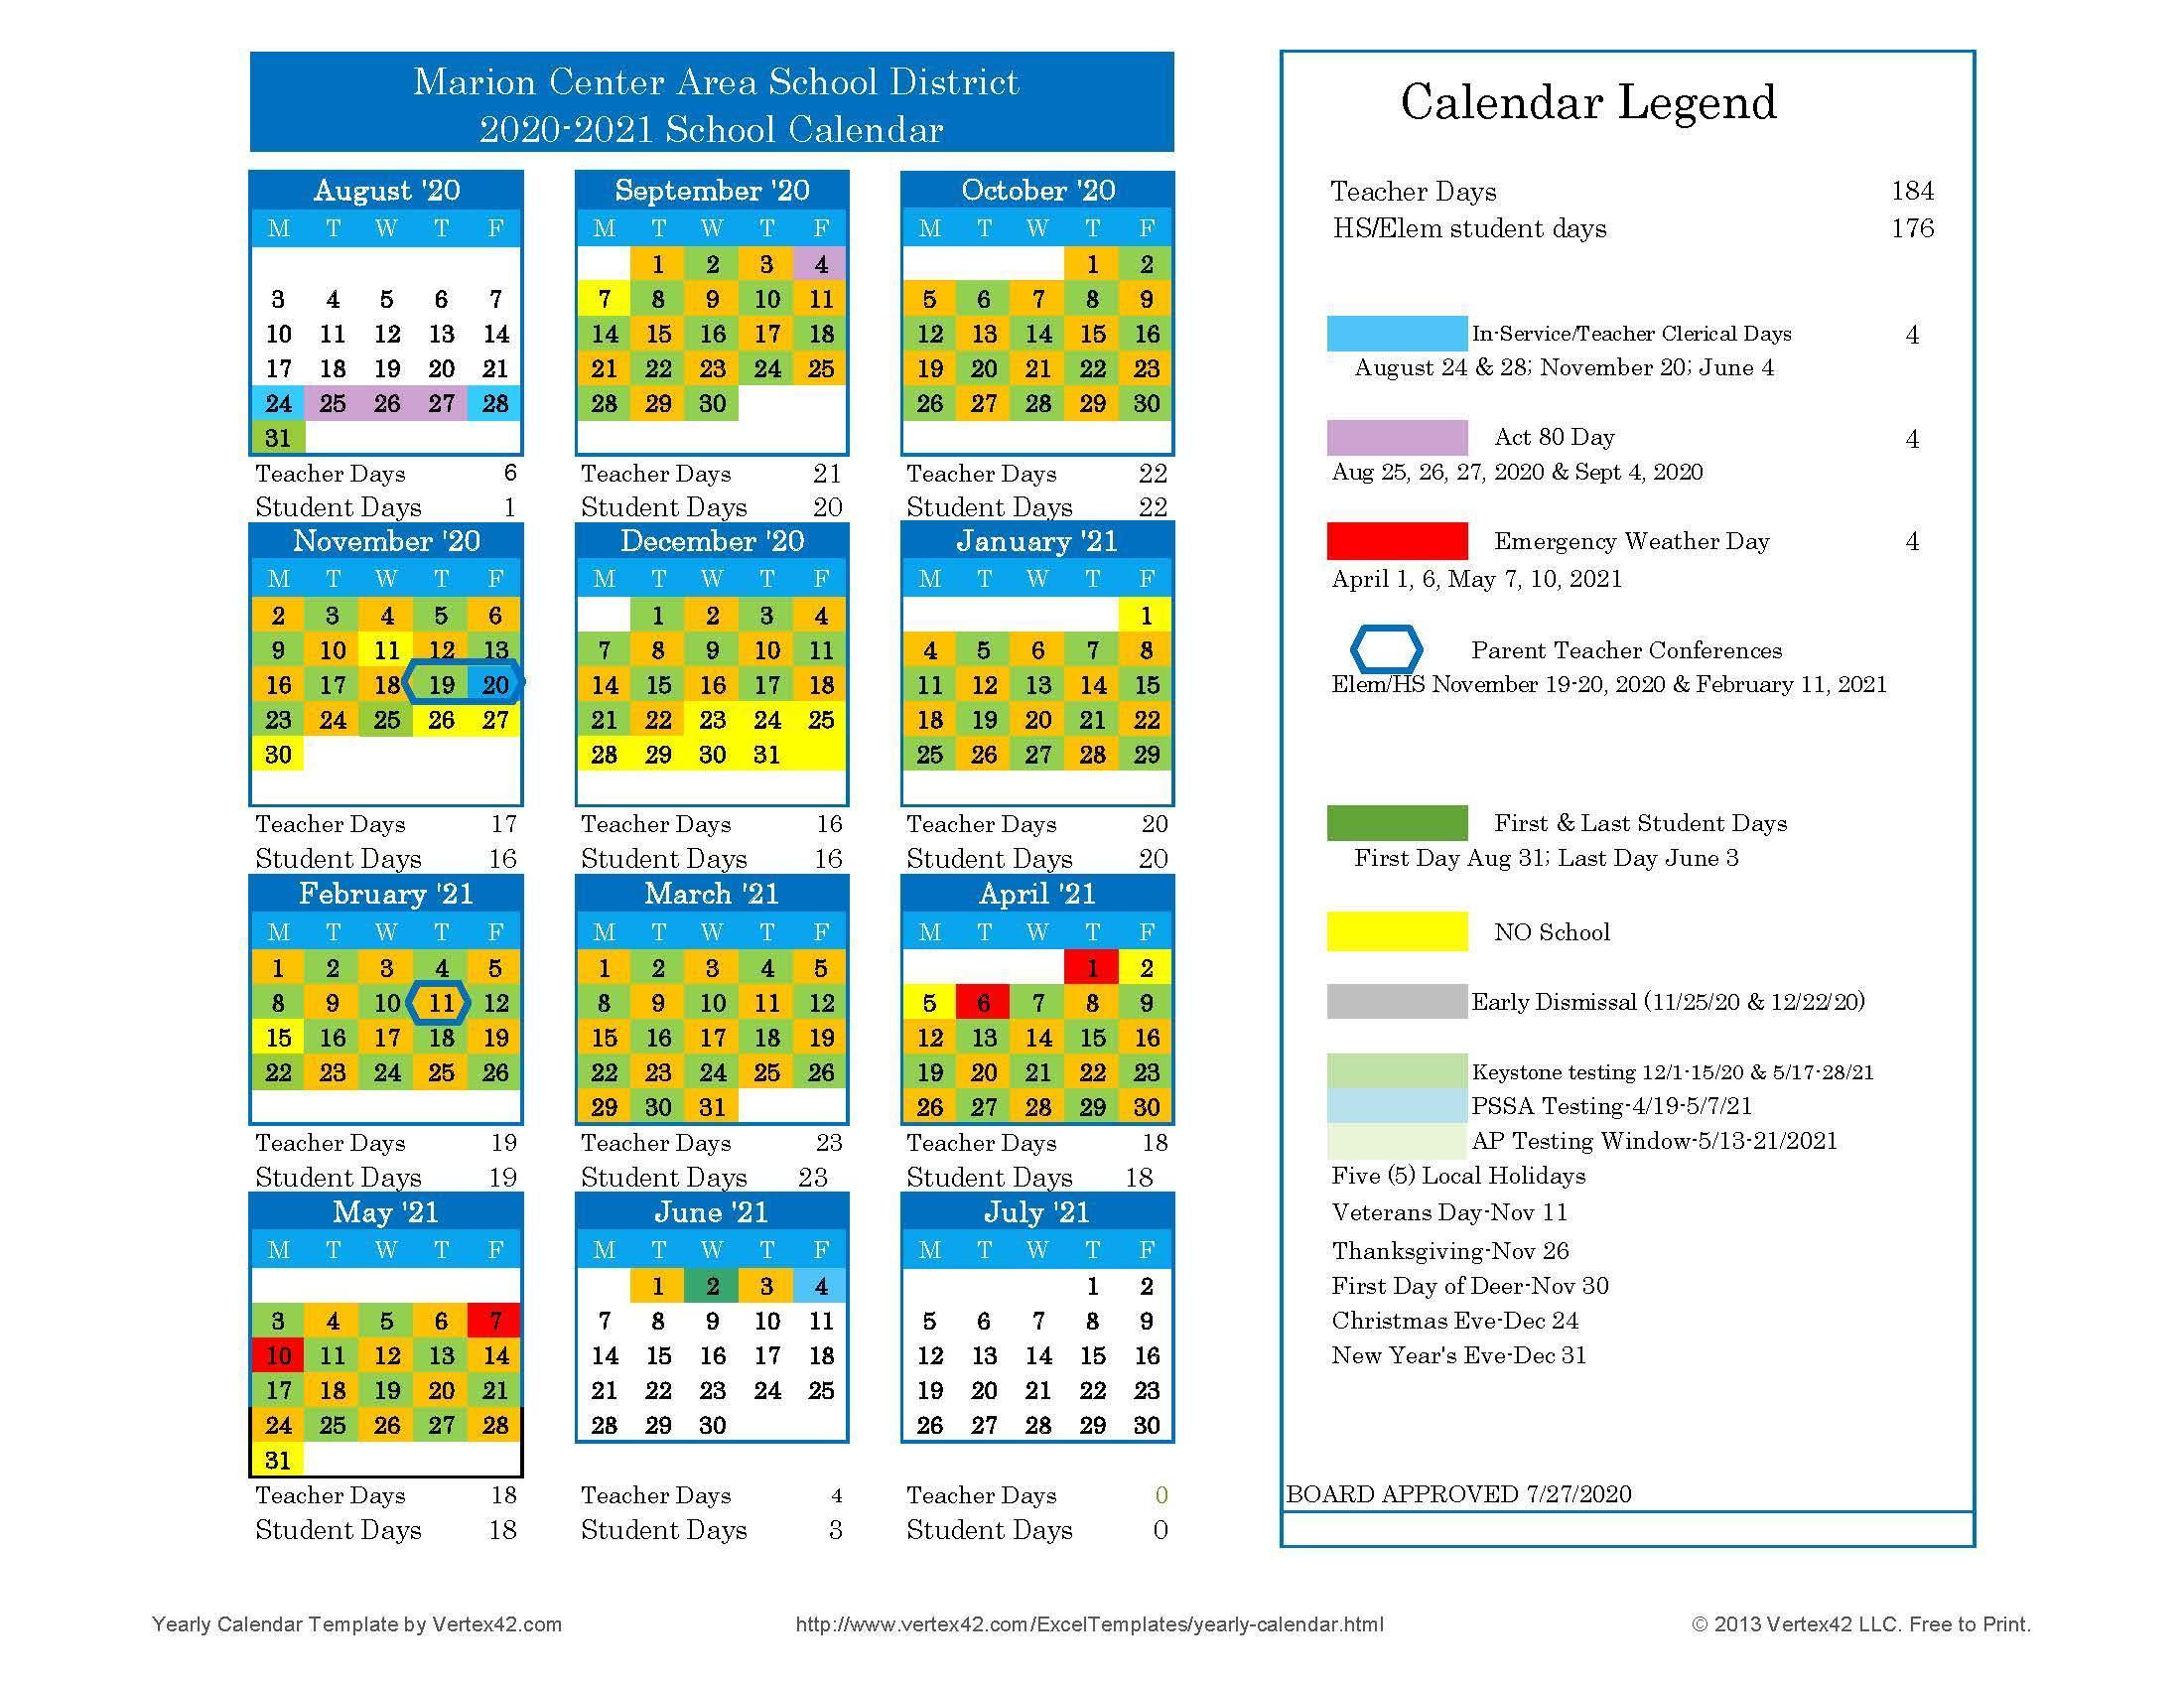 Pa Cyber School Calendar 2021-2022 Images